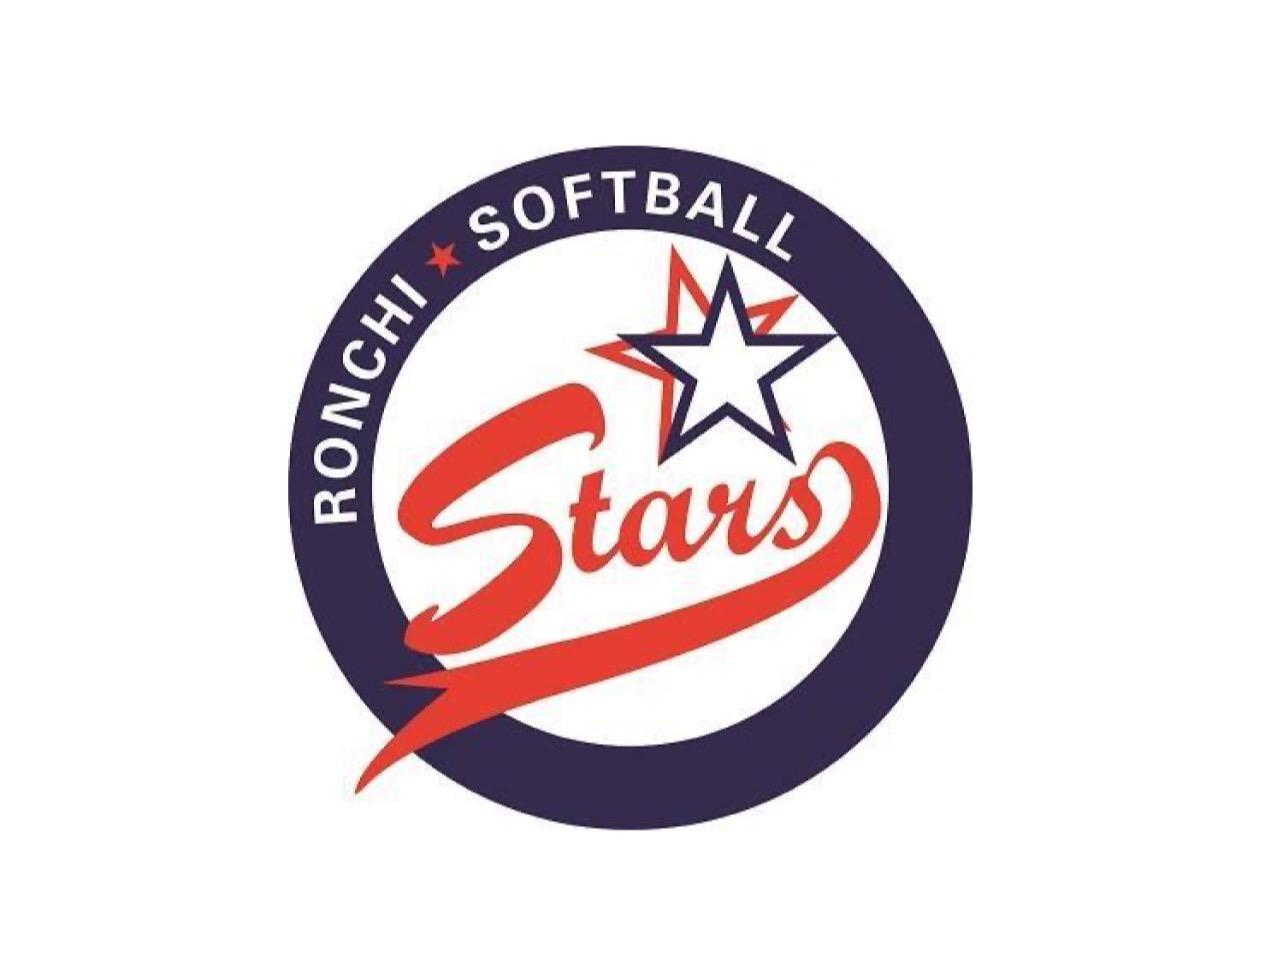 A.S.D. Stars Ronchi Softball Club <small>(RON)</small> flag